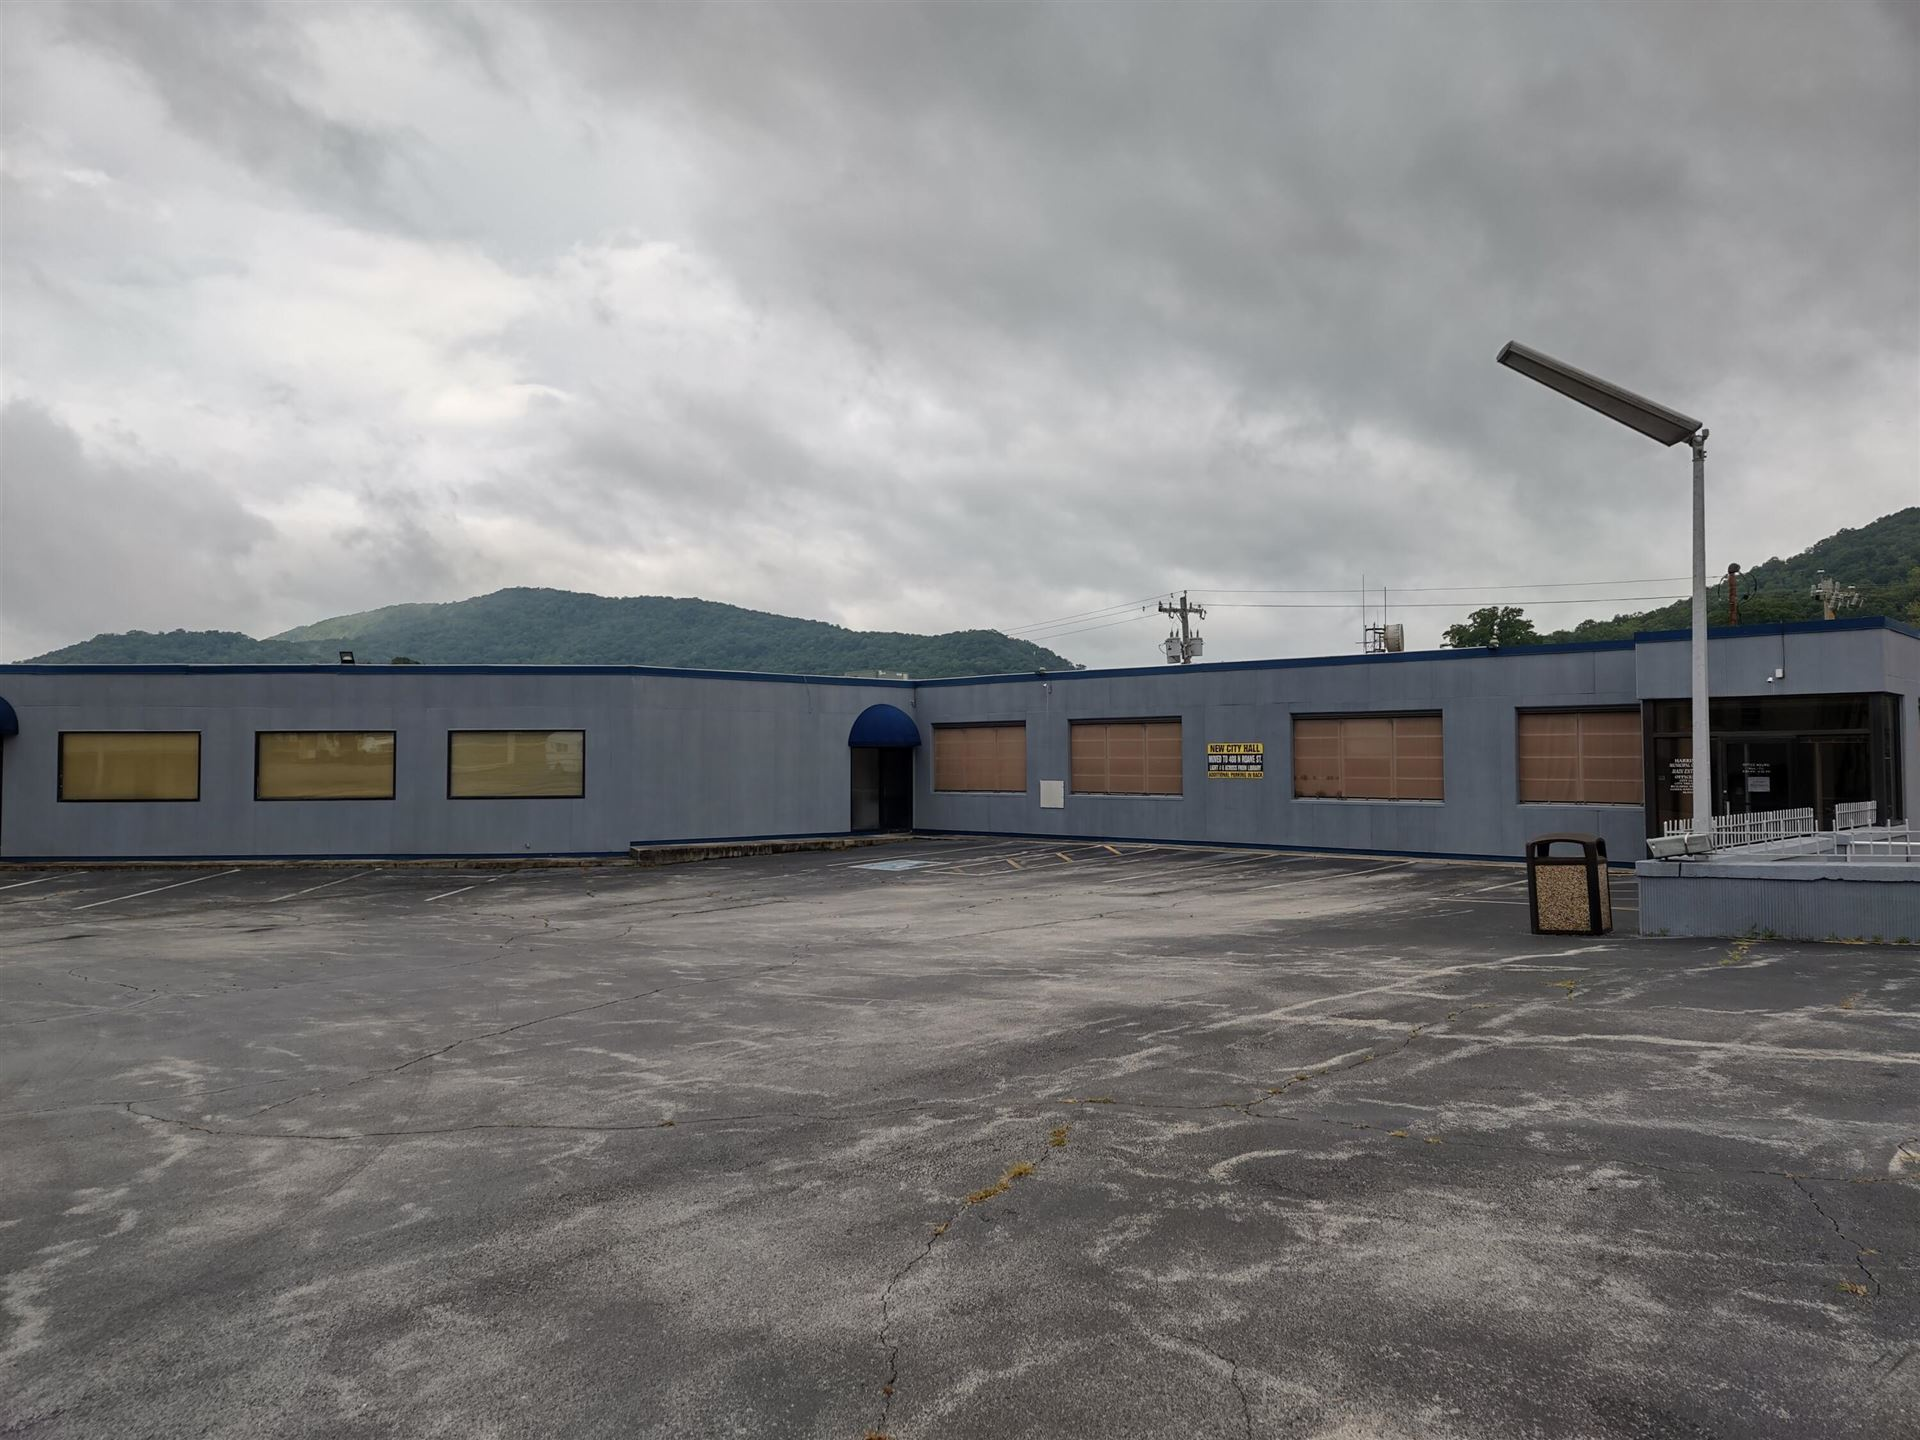 Photo of 611 N Roane St, Harriman, TN 37748 (MLS # 1163537)